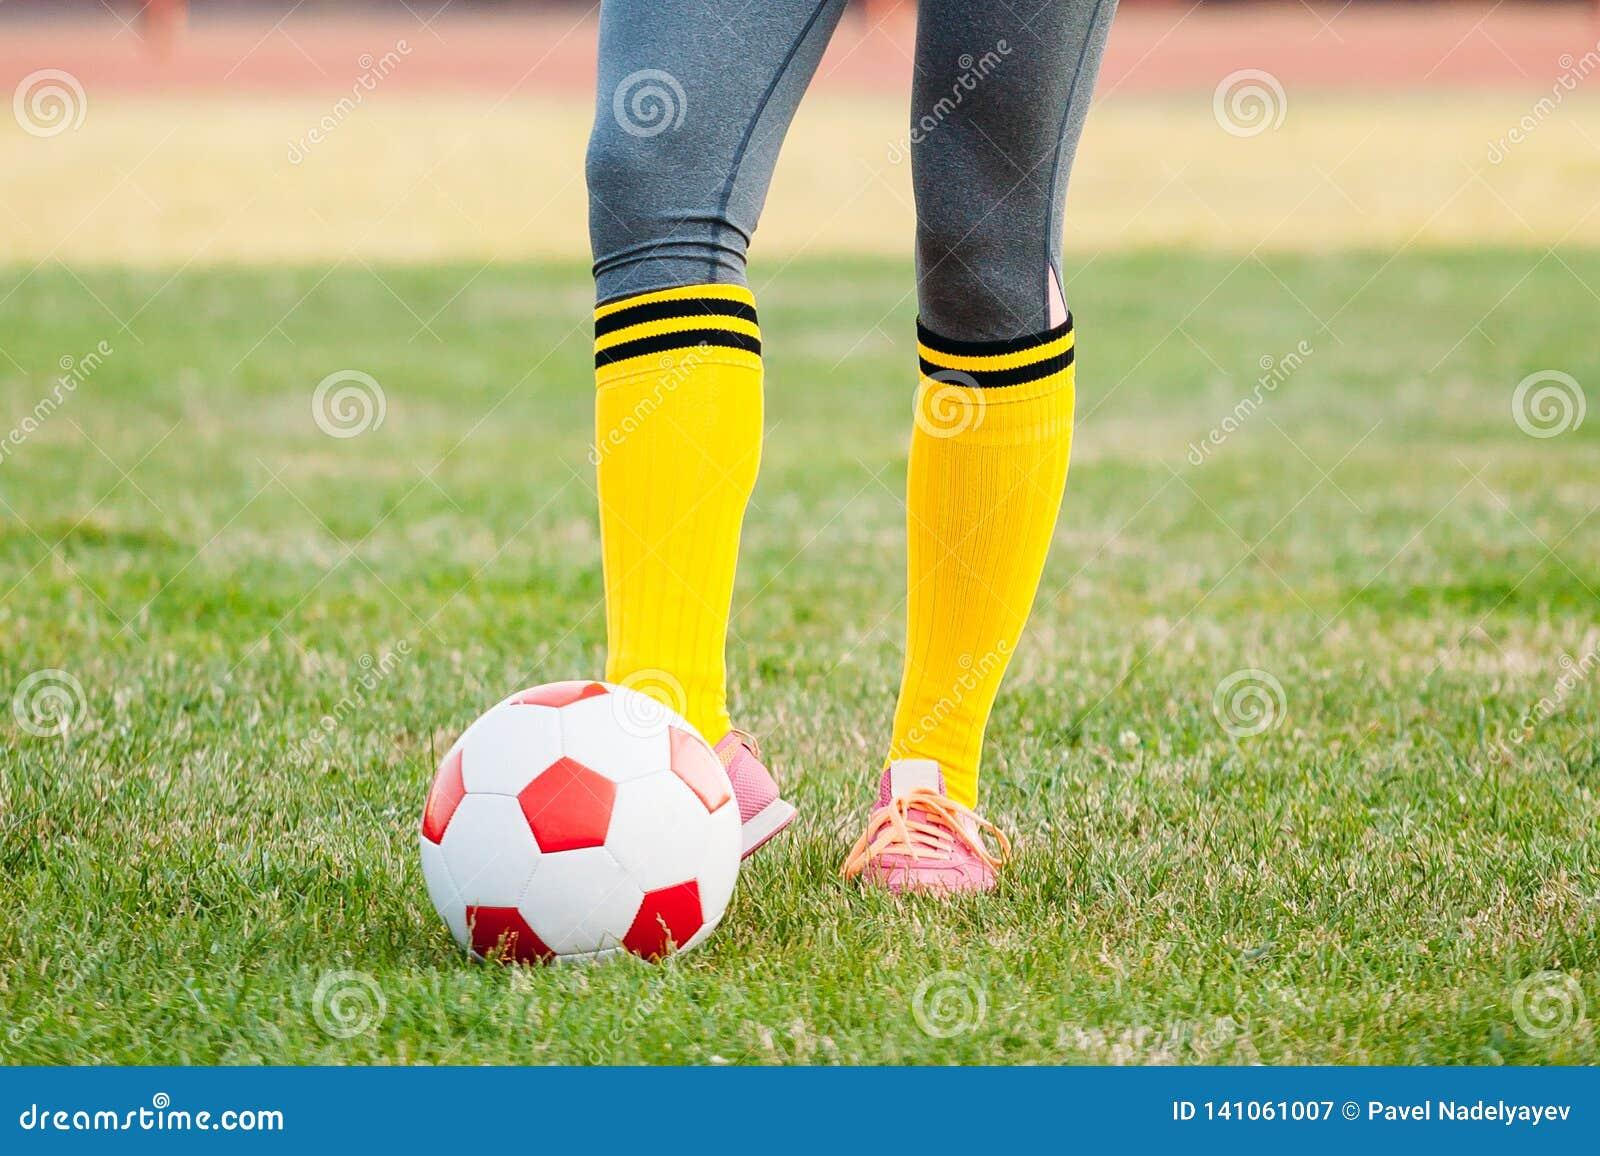 Young woman soccer player kicks ball on football field